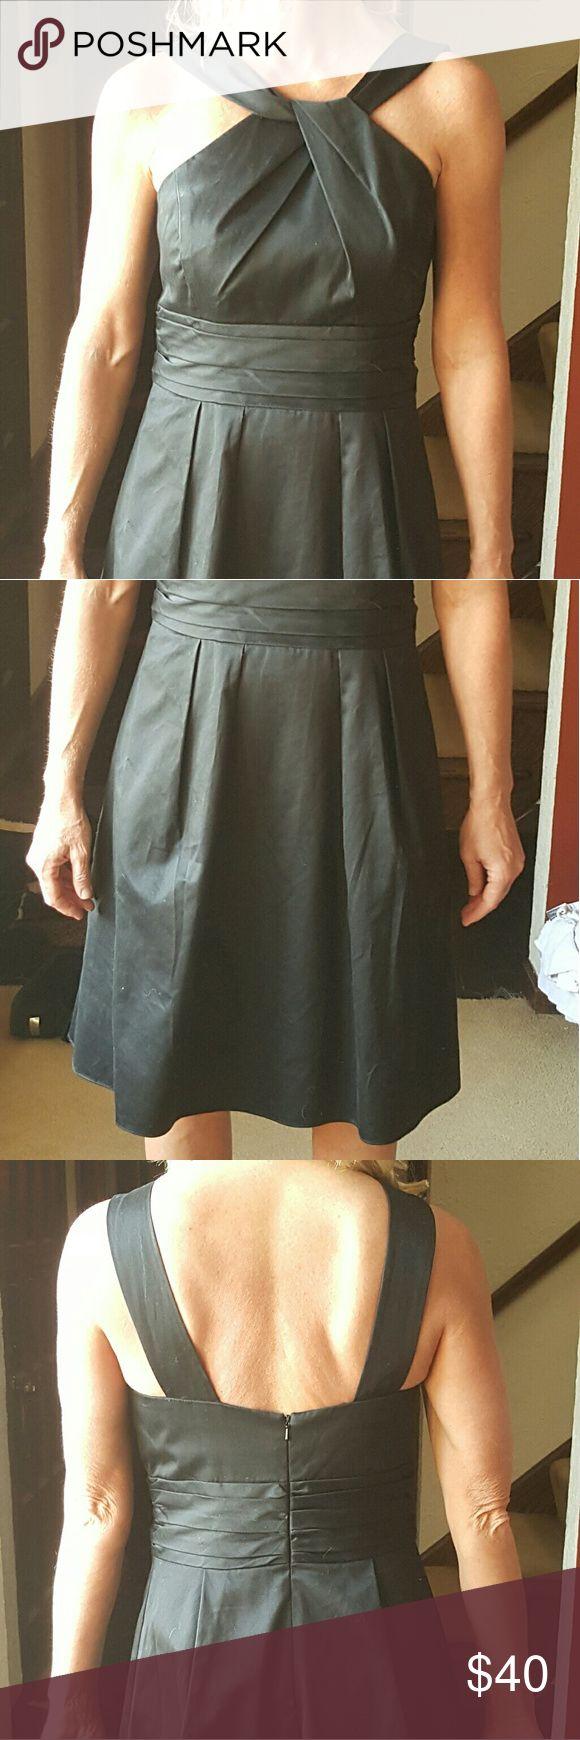 Cocktail dress High waist and full skirt Front pockets  Zip back Tea length  Worn once David's Bridal Dresses